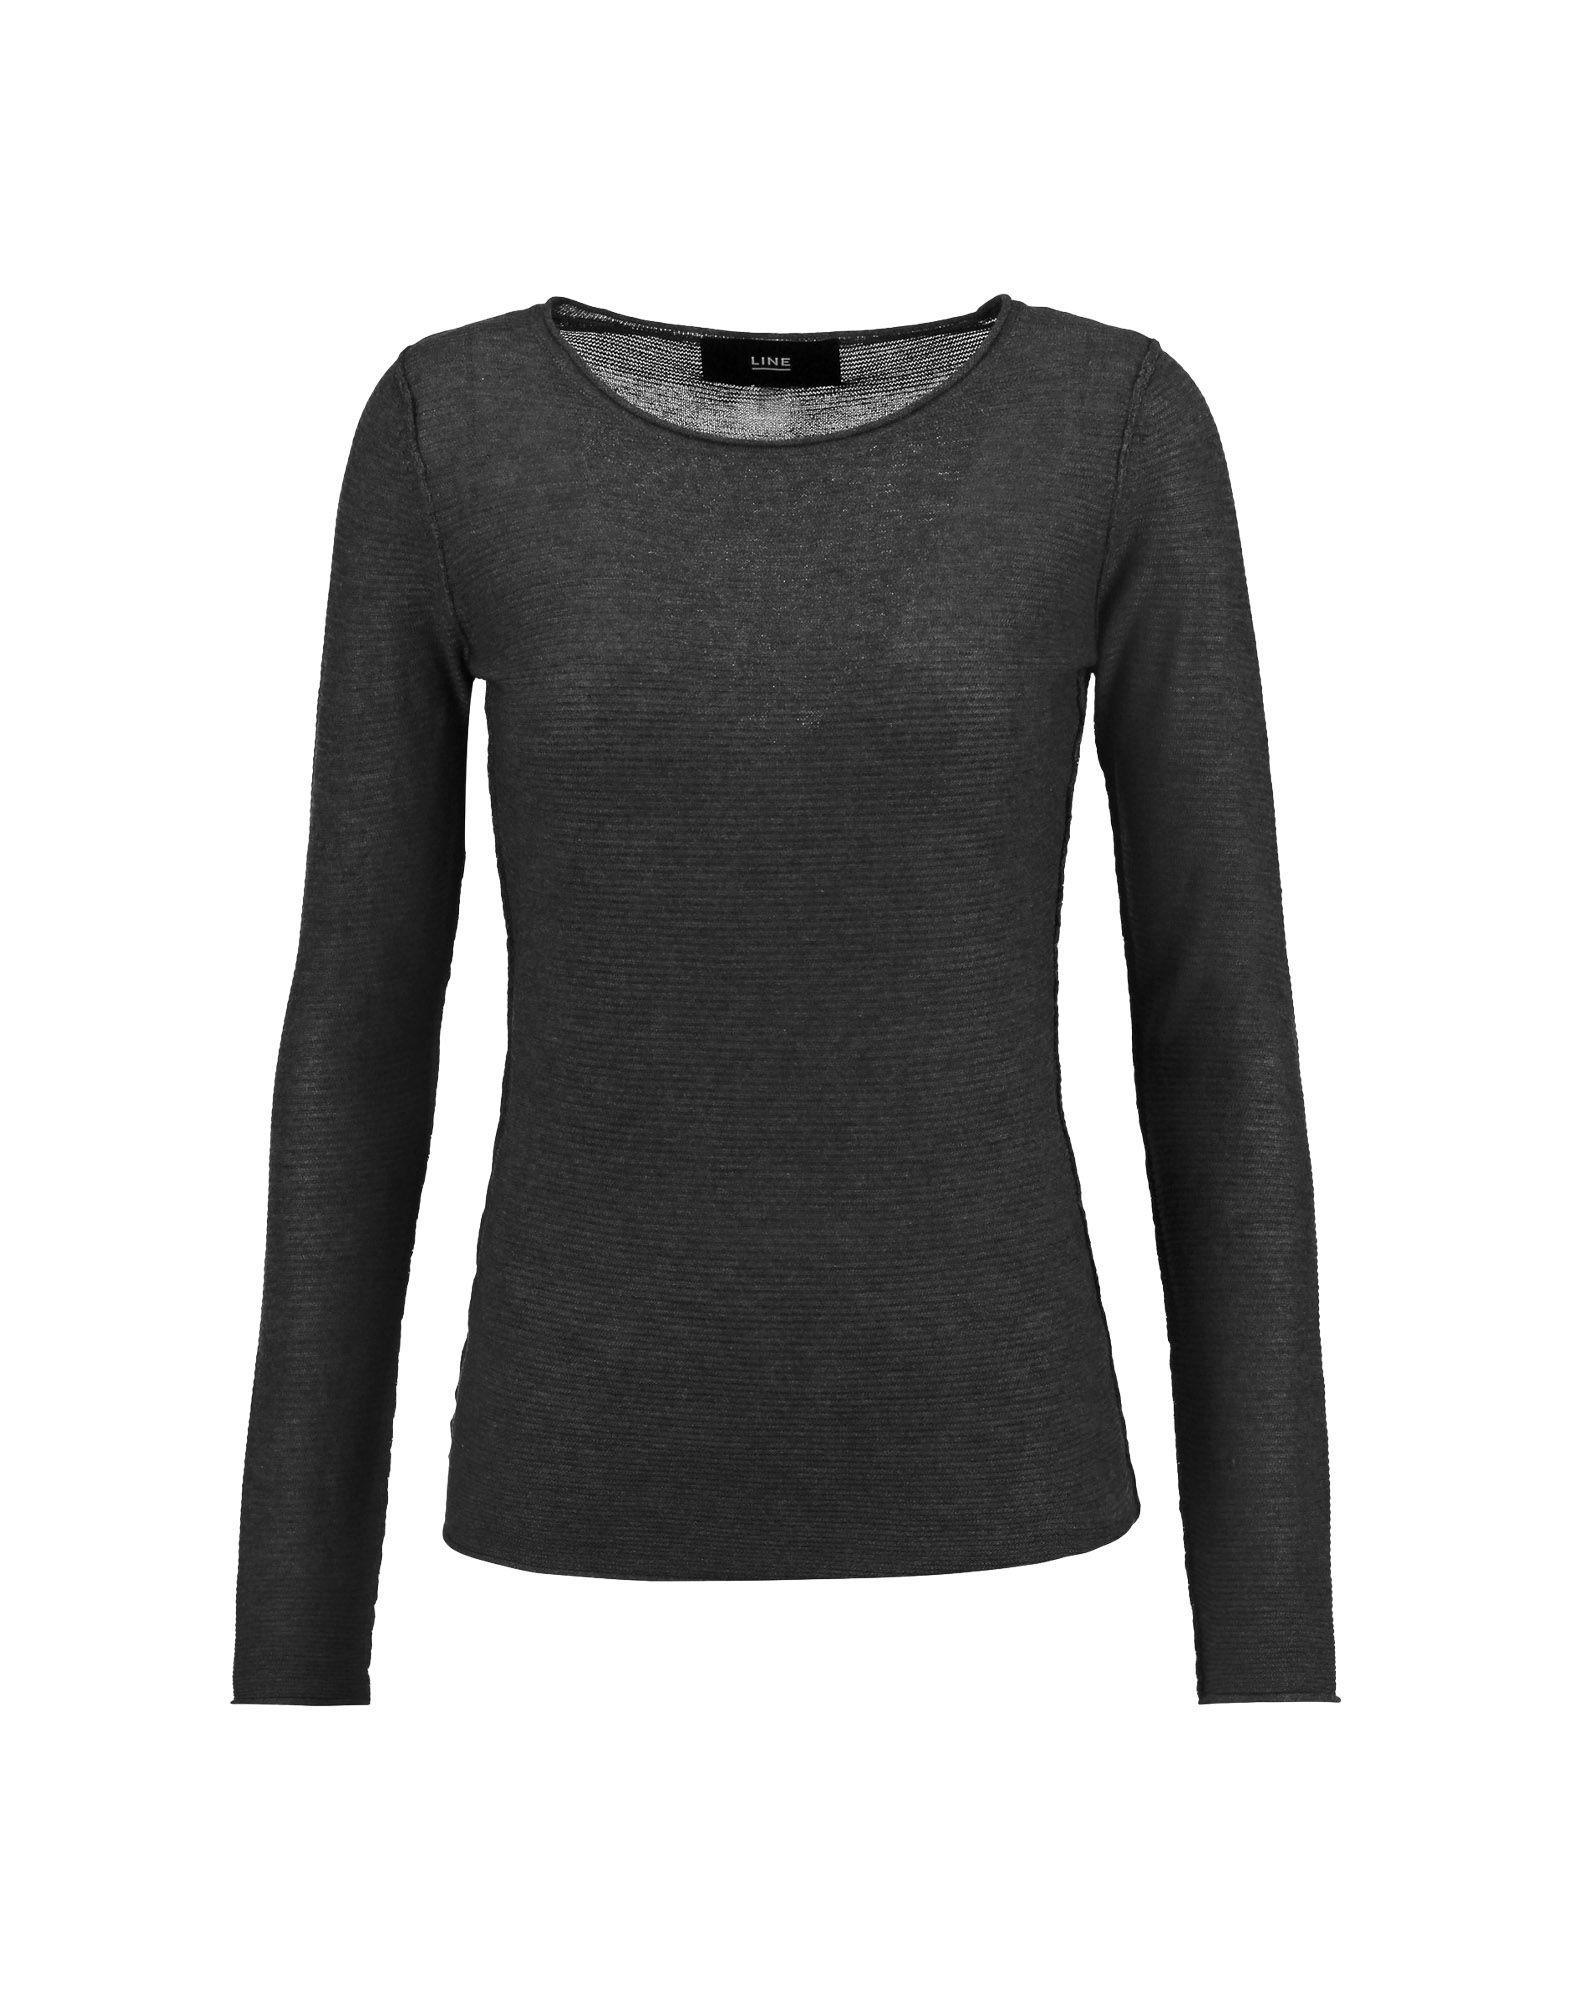 LINE Sweater in Lead